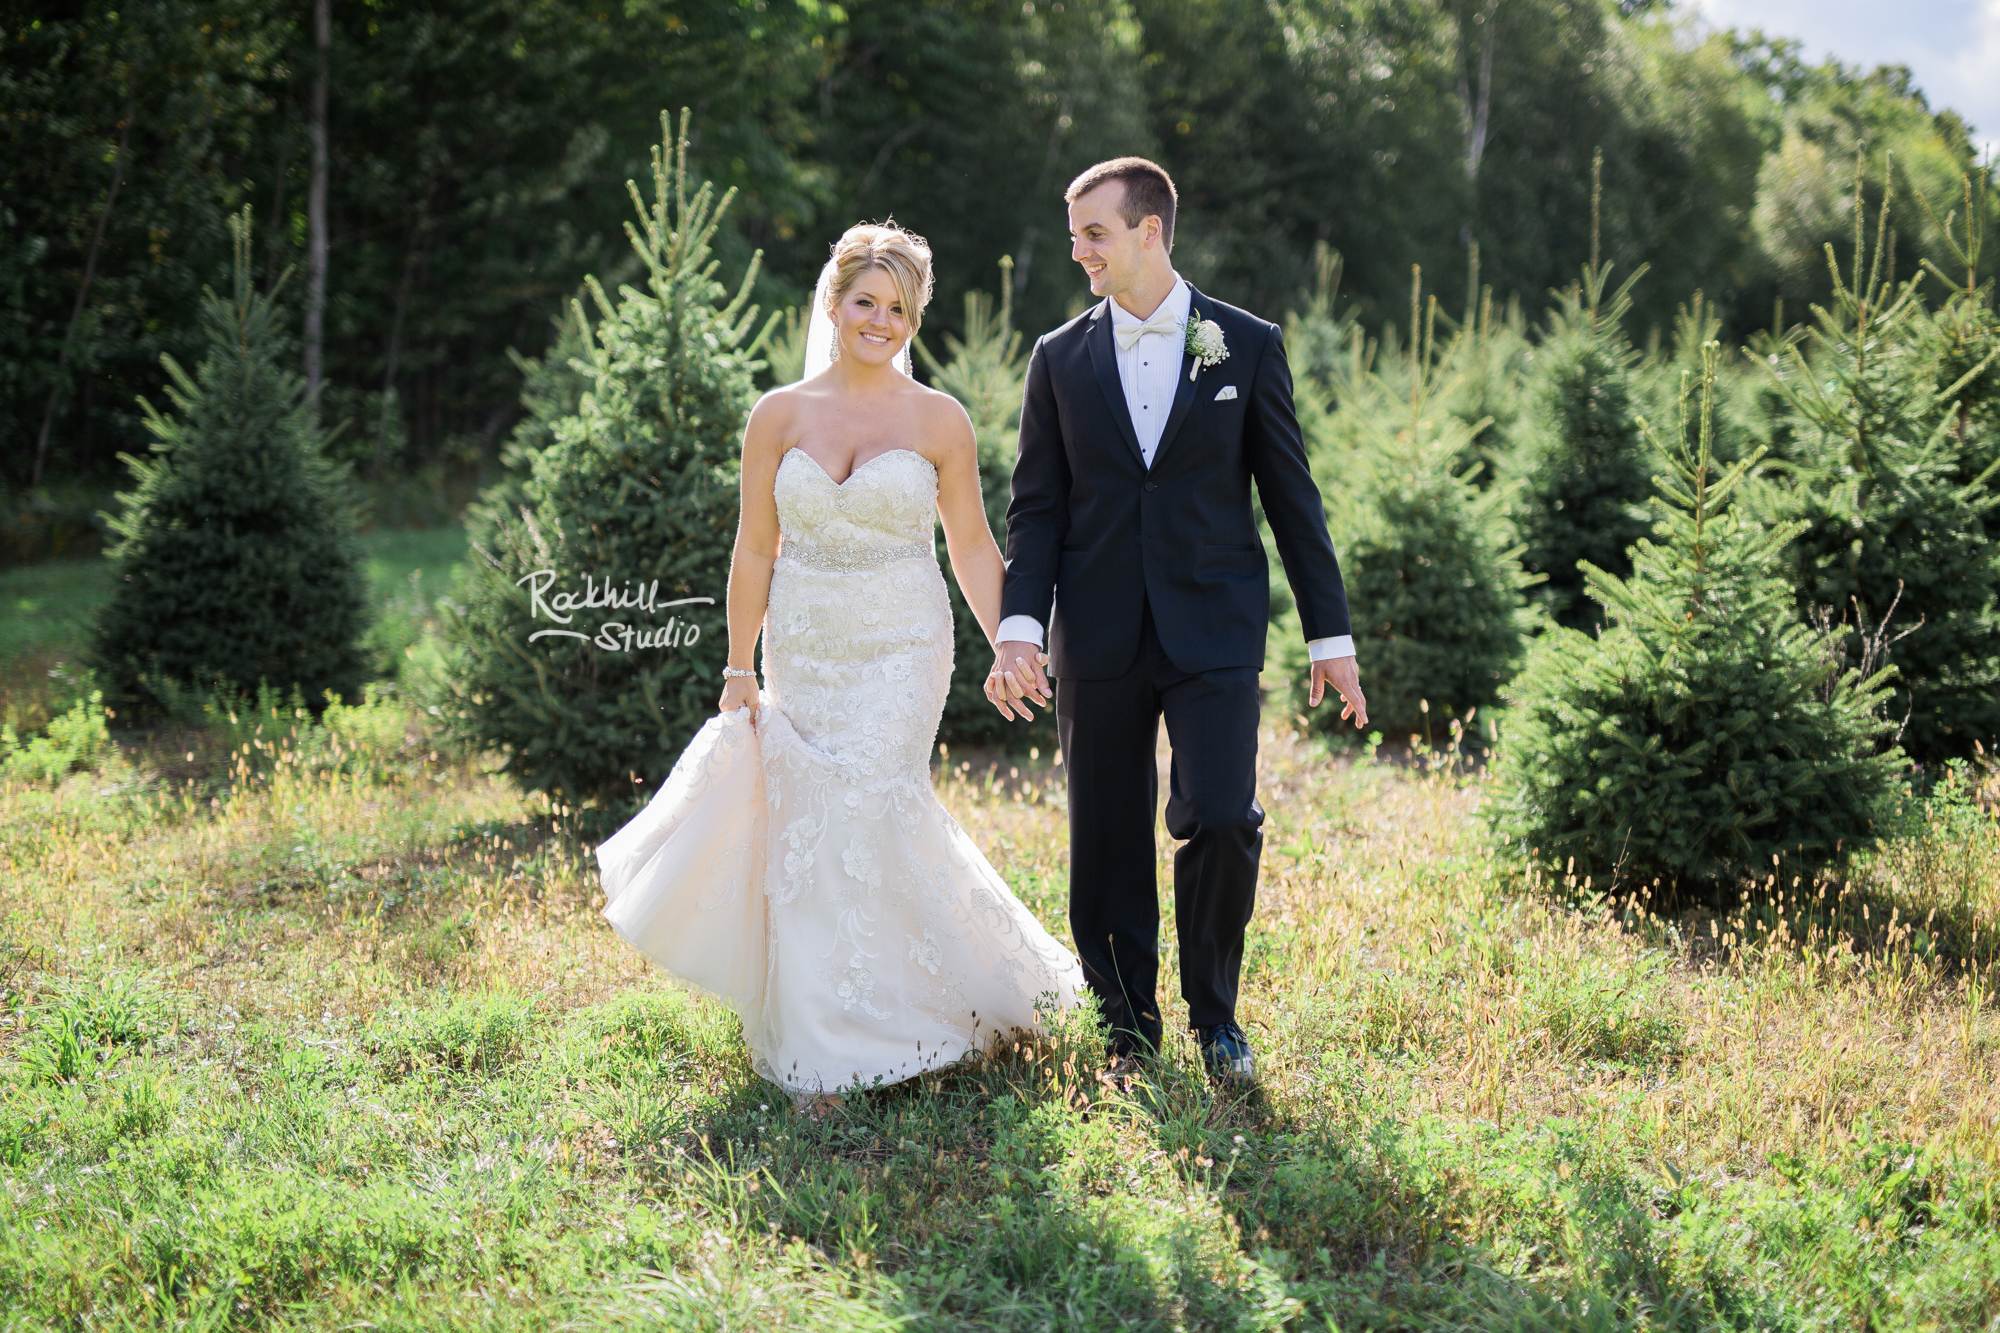 marquette-wedding-photographer-upper-peninsula-michigan-bridal-couple-field-tree-farm.jpg